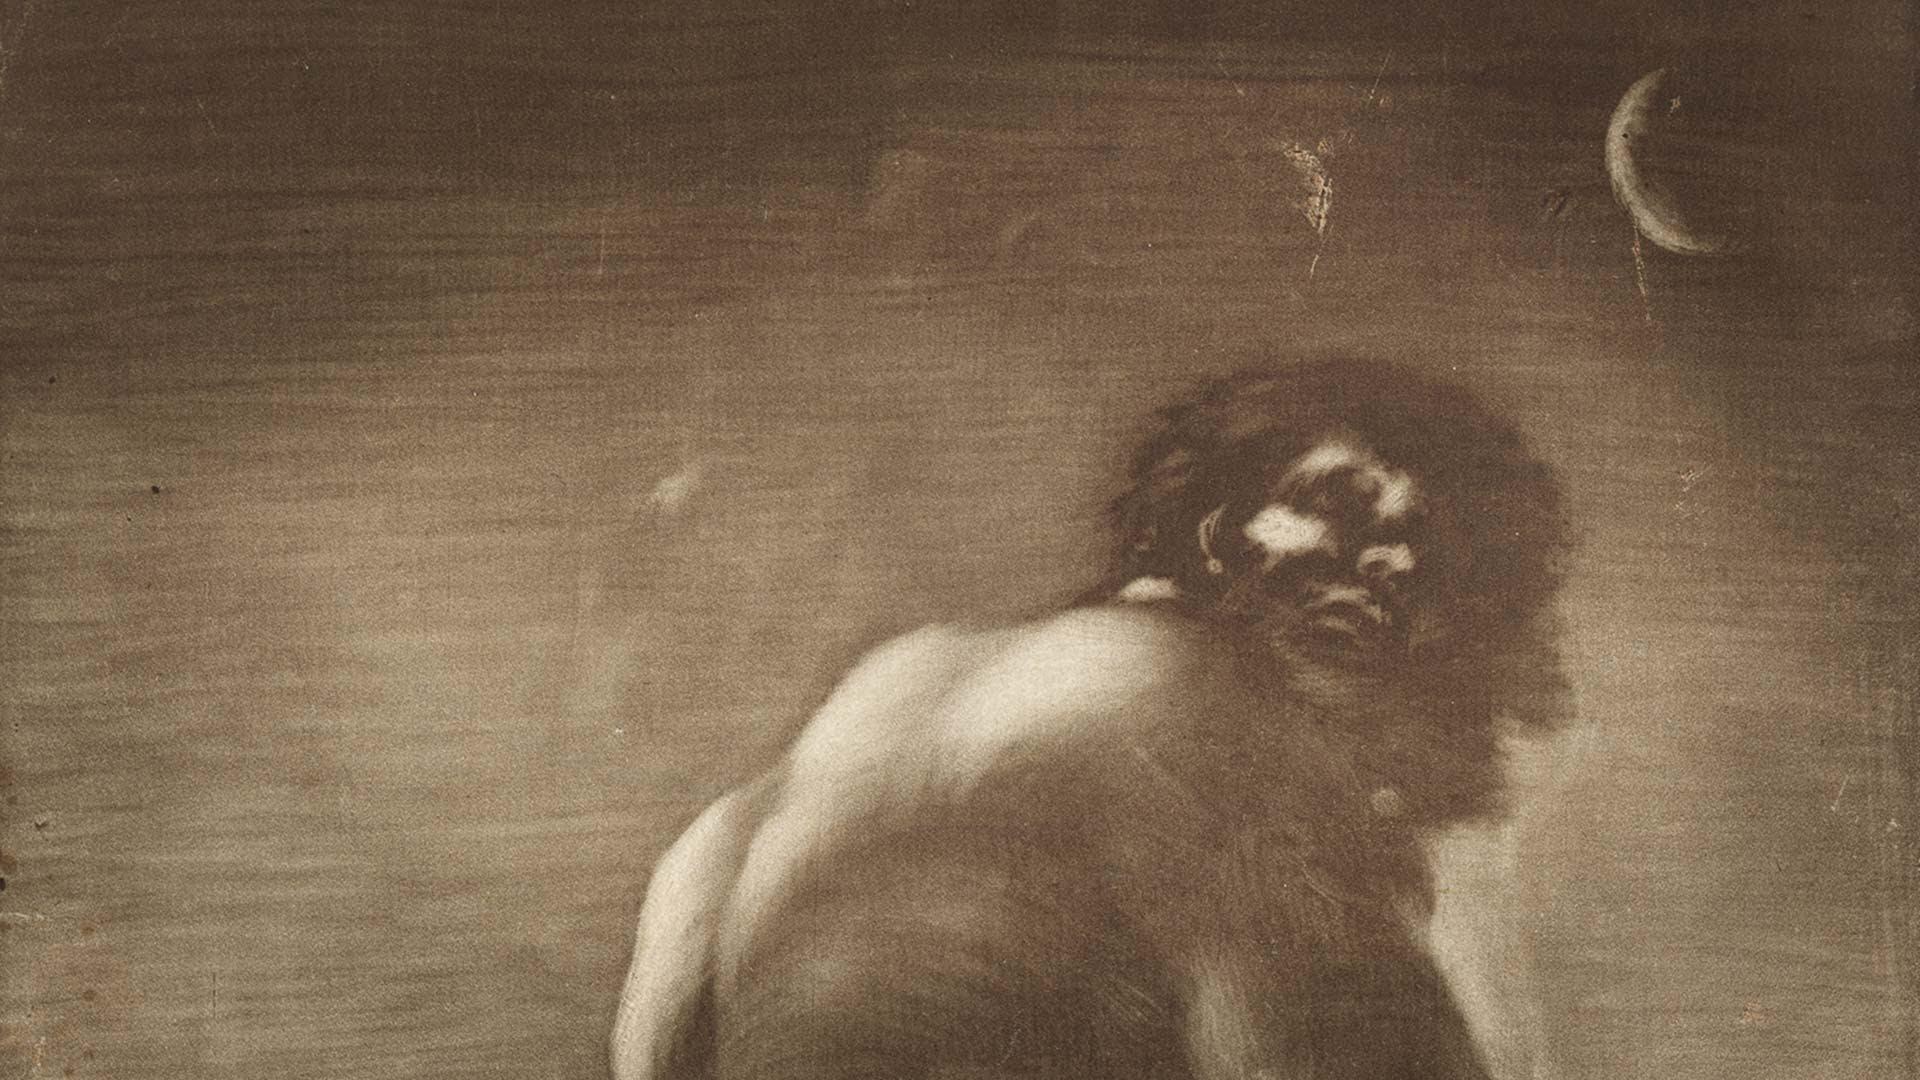 「Andrew Solomon:憂鬱,我們共享的秘密」- Depression, the Secret We Share